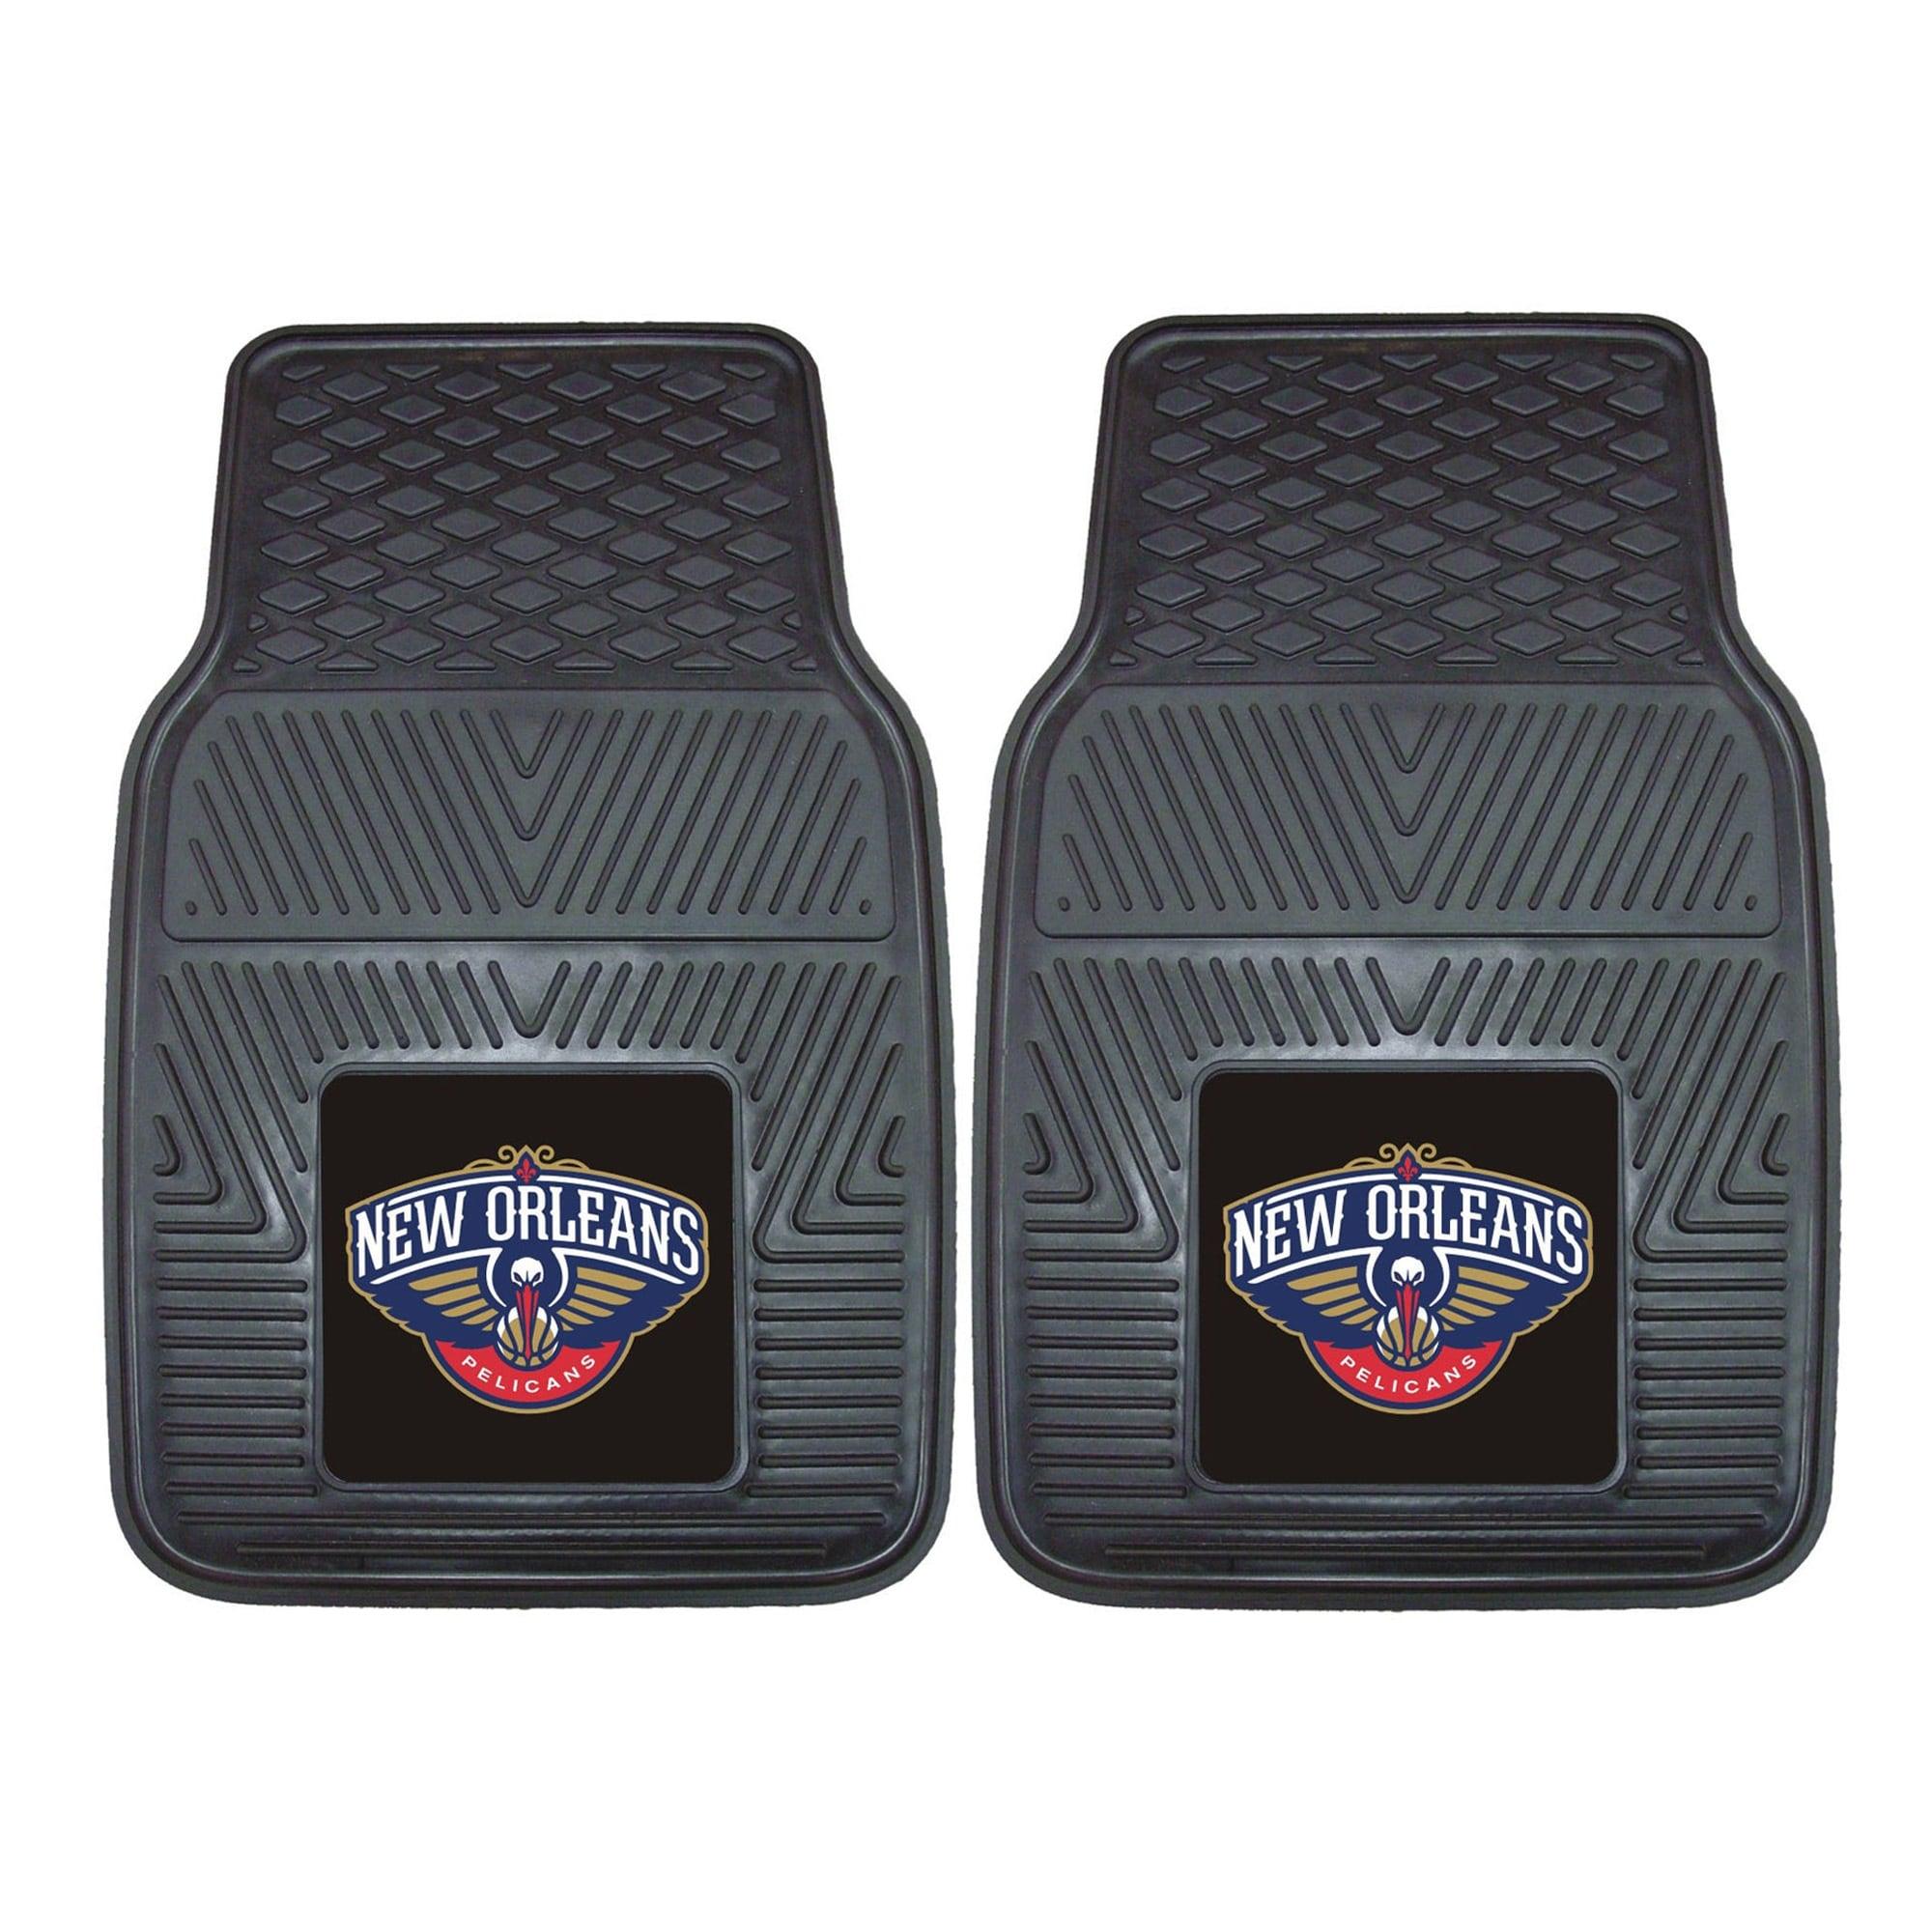 "New Orleans Pelicans 27"" x 18"" 2-Pack Vinyl Car Mat Set"